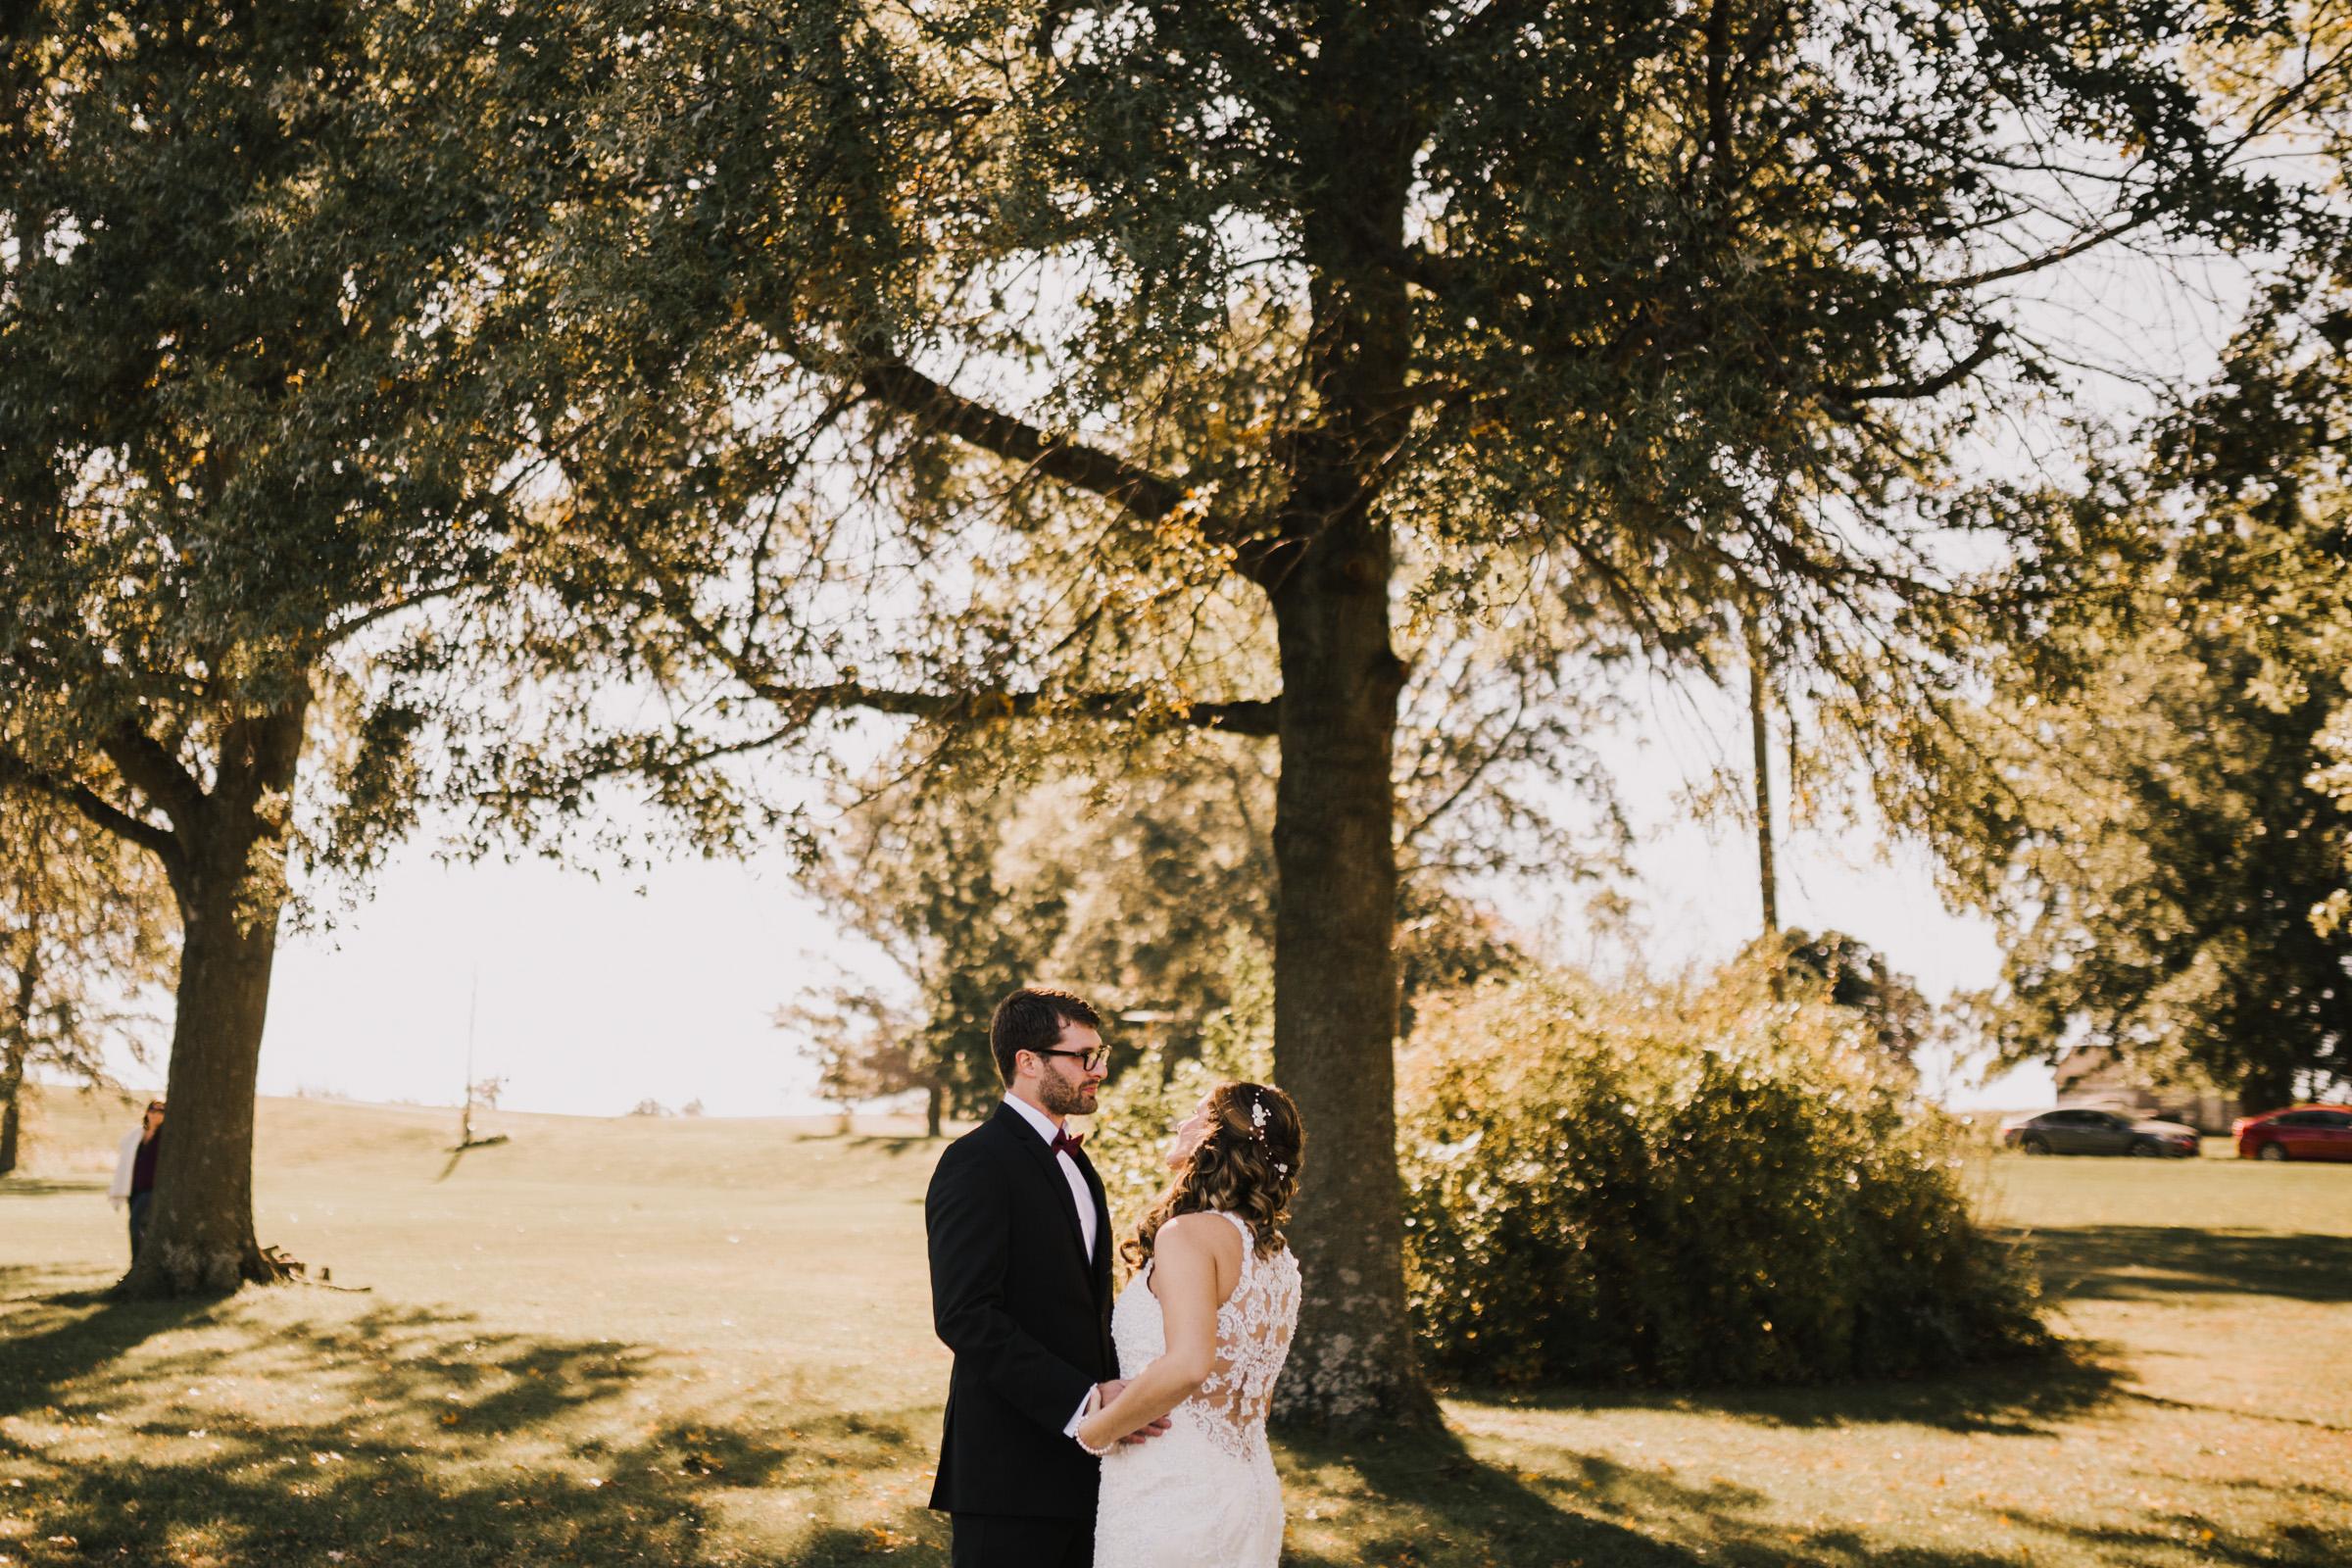 alyssa barletter photography intimate fall autumn wedding rural missouri wedding photographer-10.jpg